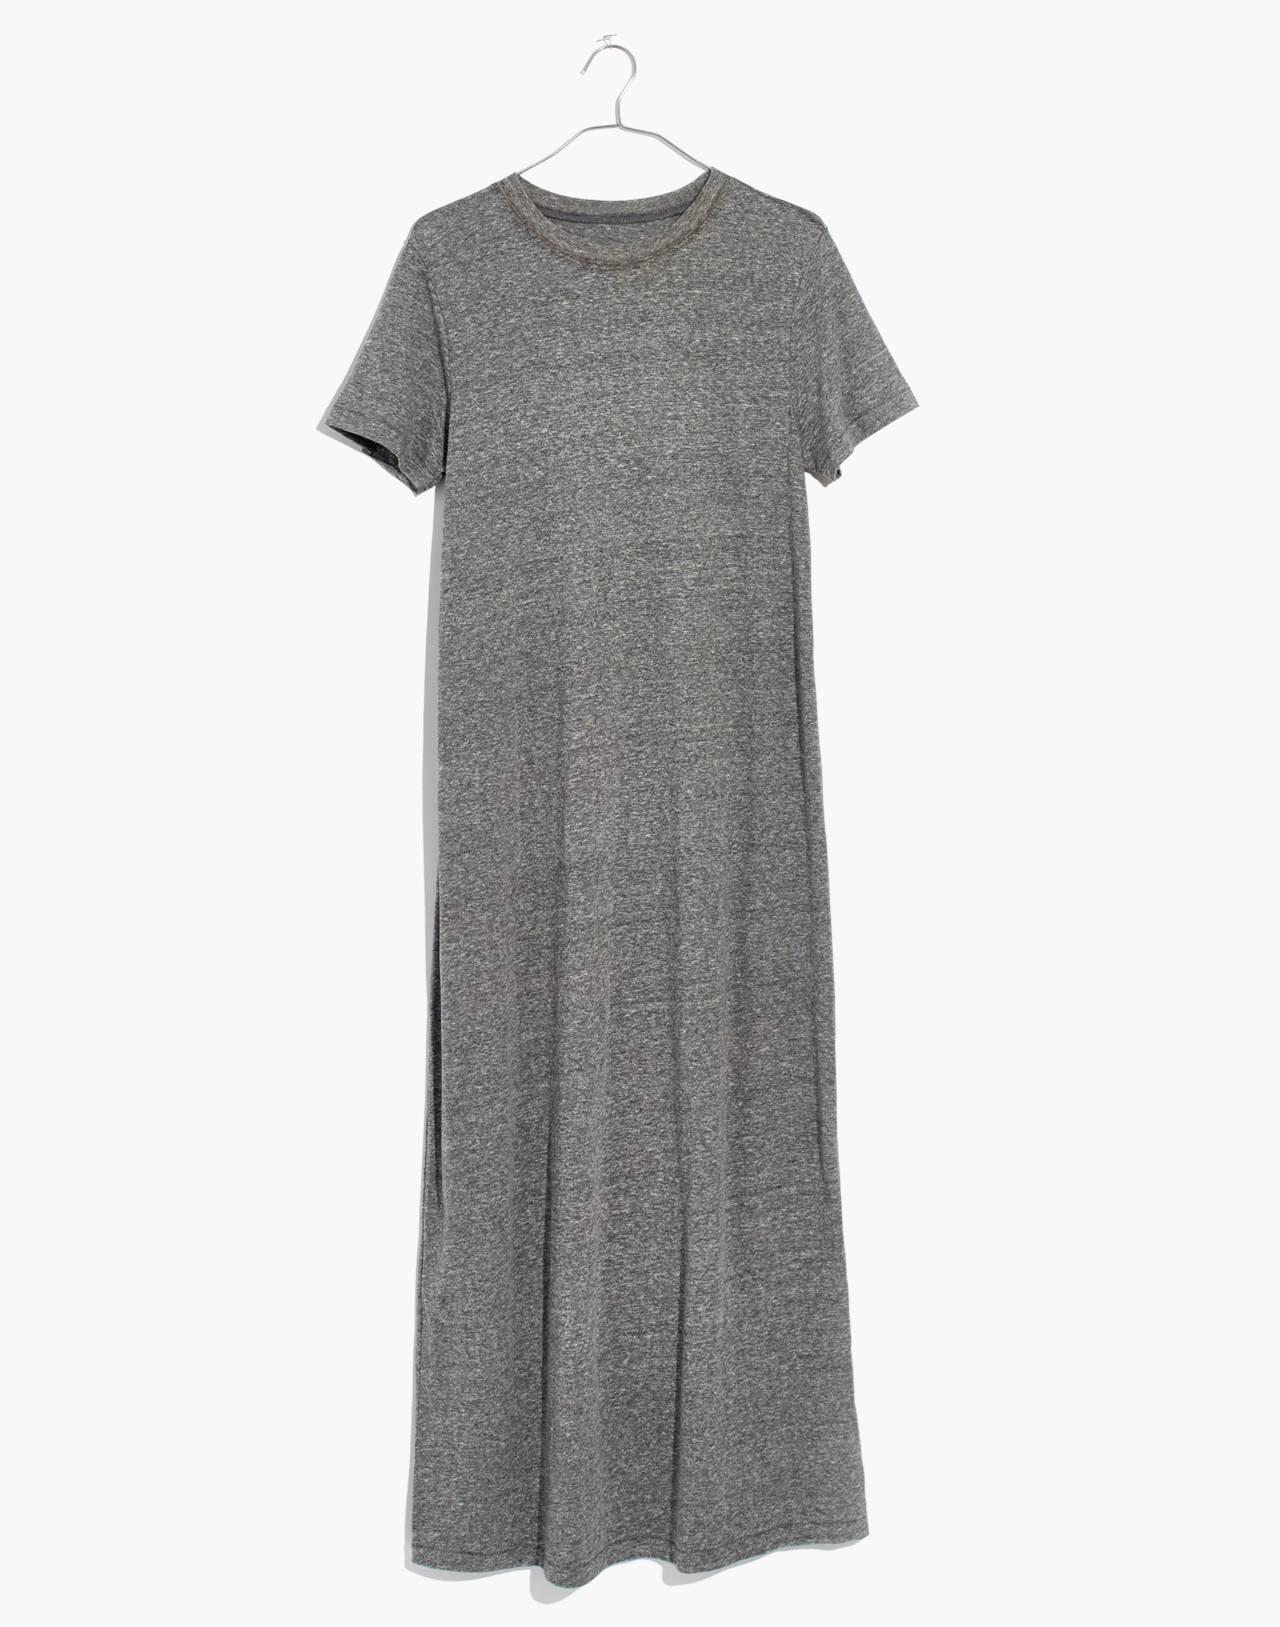 Rivet & Thread Tee Dress in hthr grey image 4